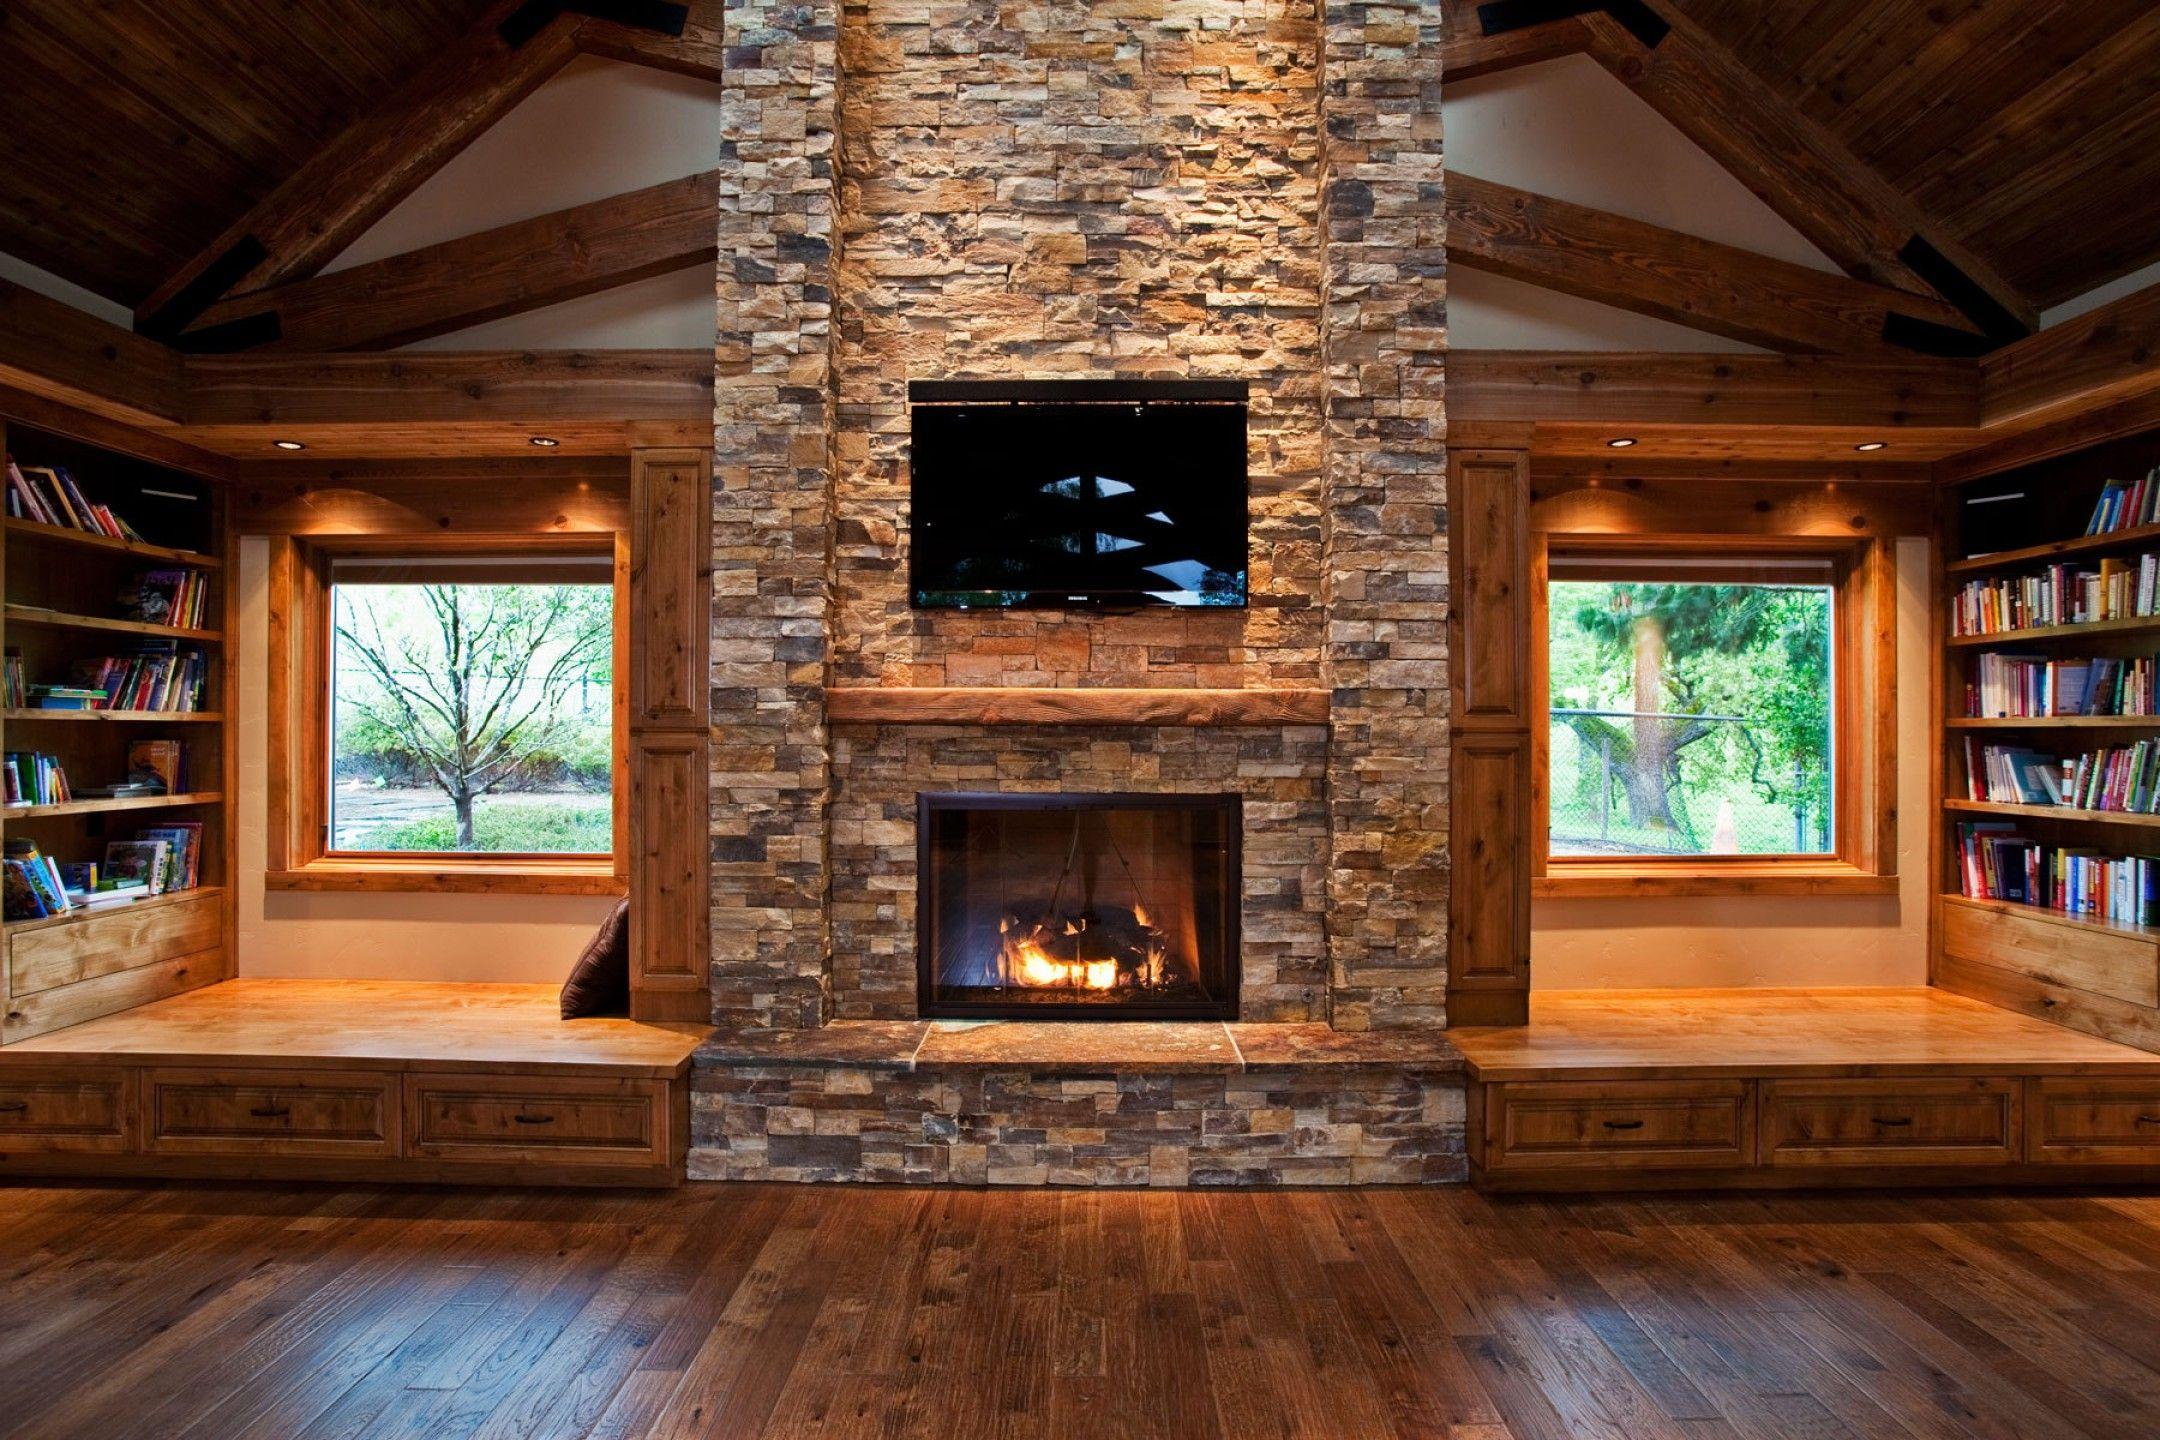 Log Cabin Fireplace Ideas Furniture Log Cabin Decorating